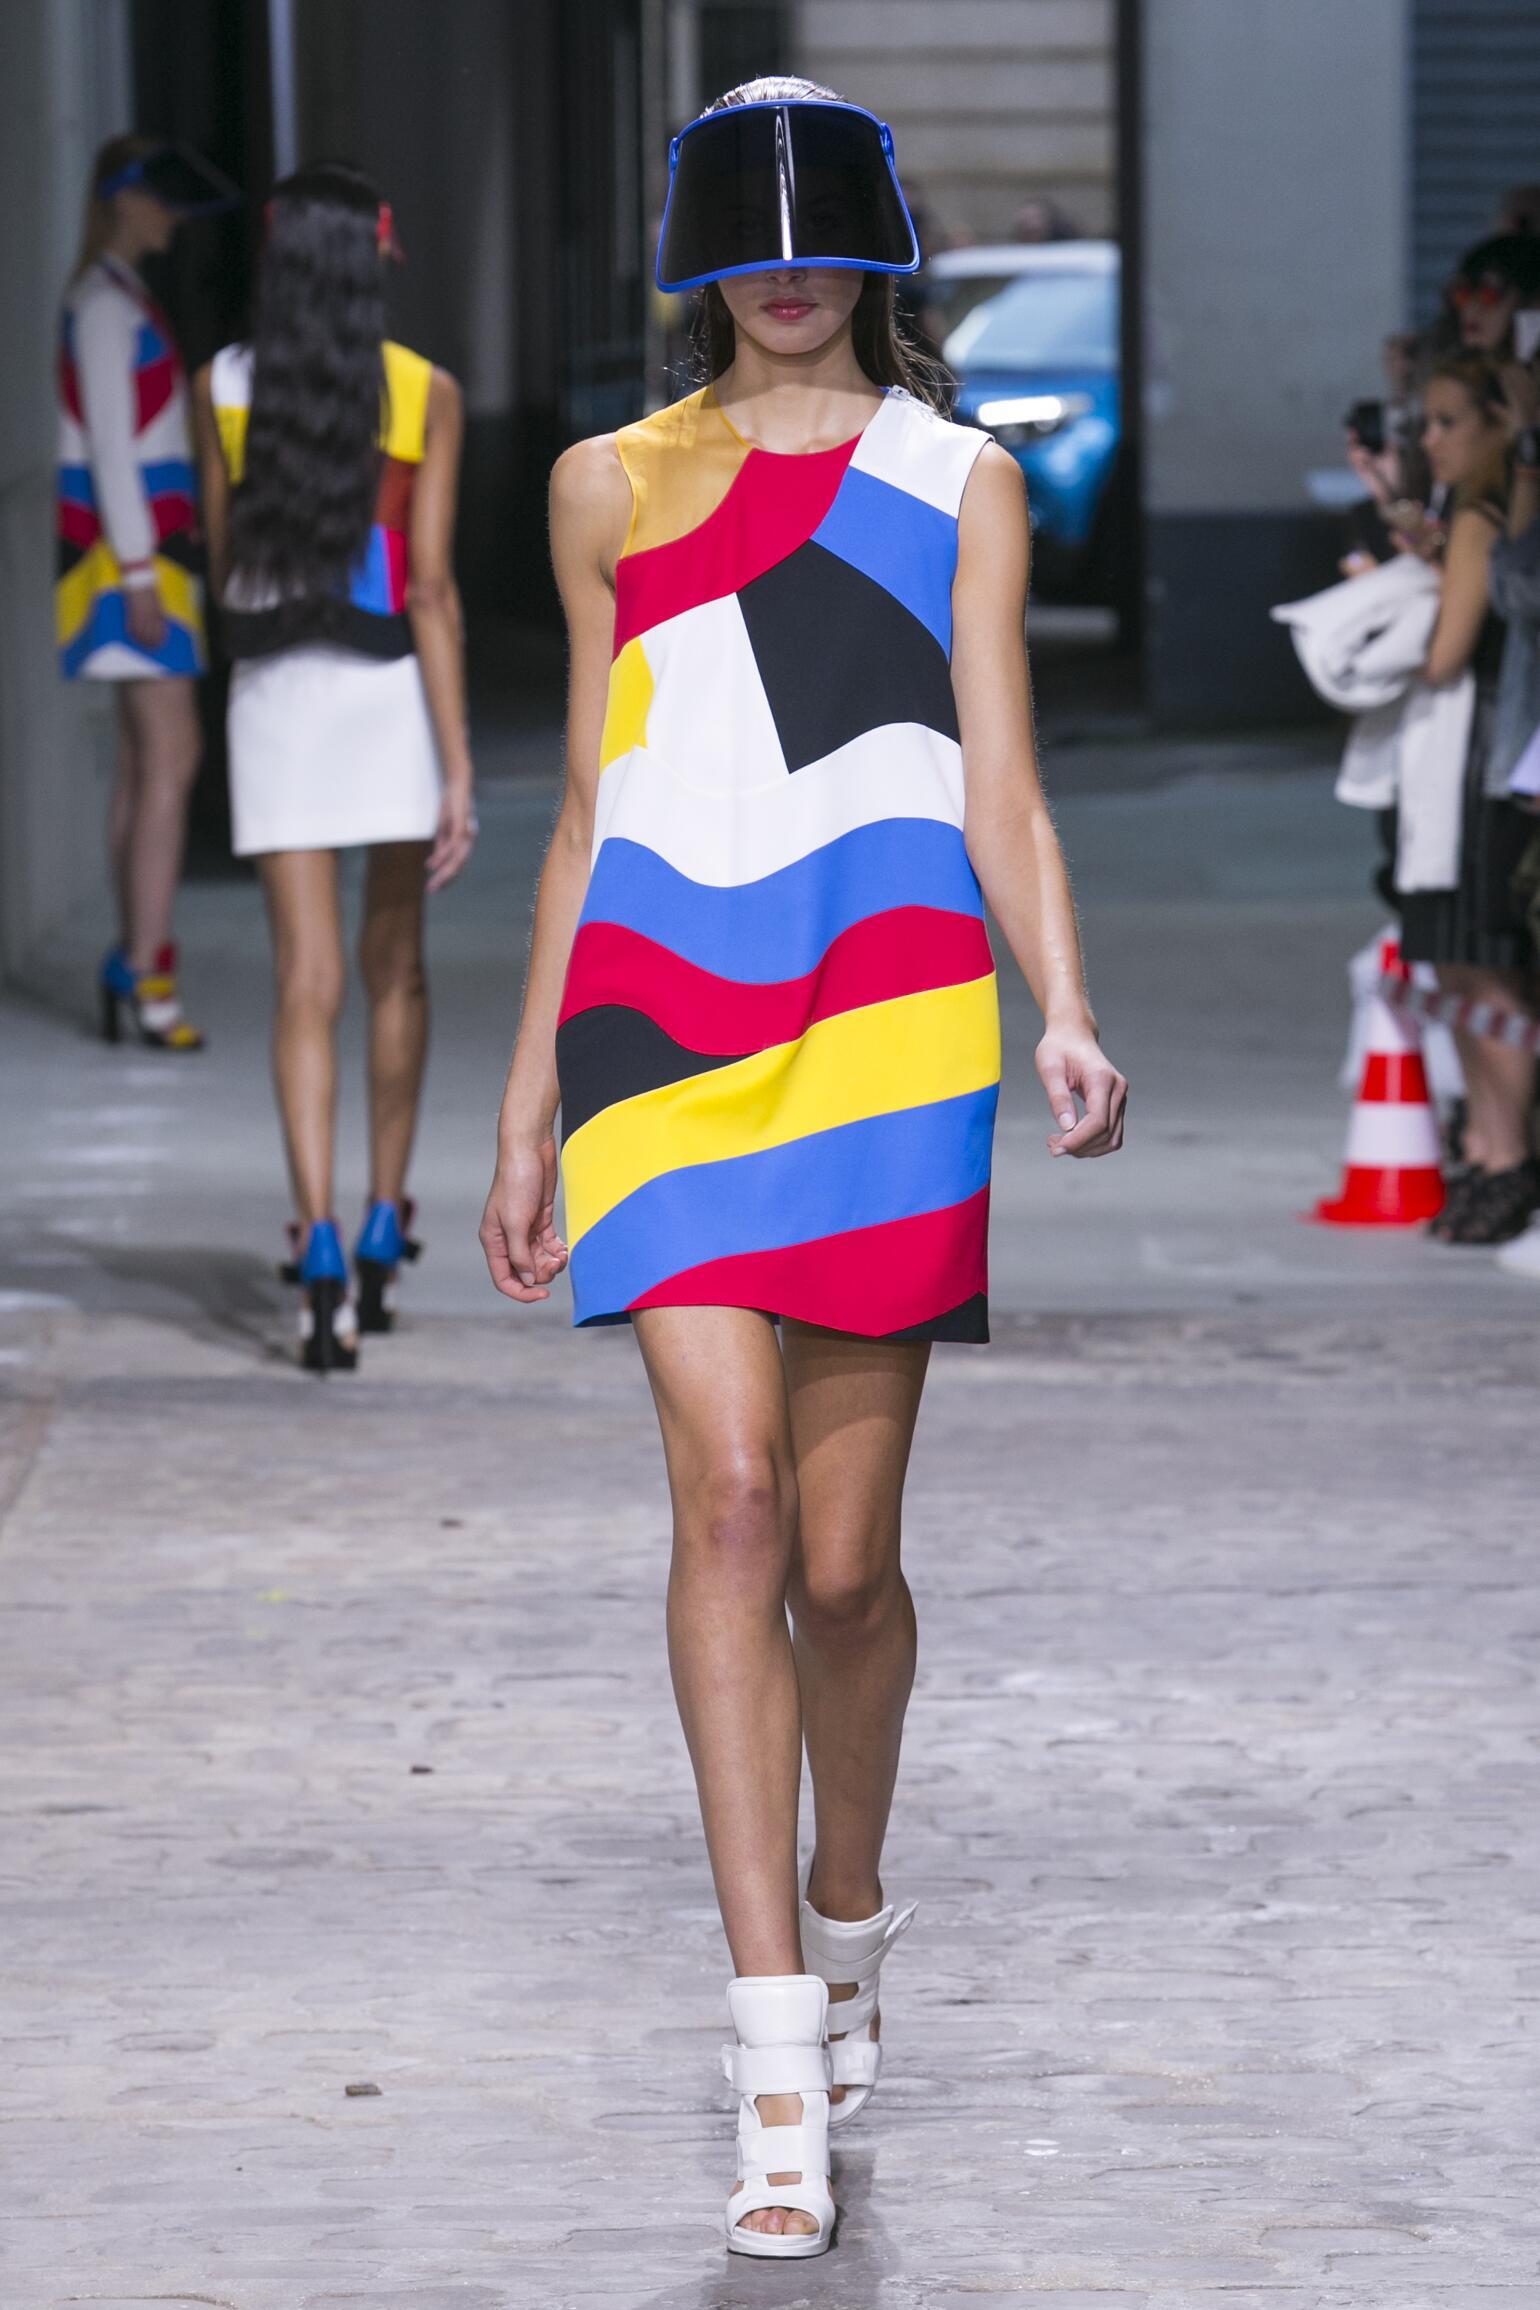 Summer 2015 Fashion Show Jean-Charles de Castelbajac